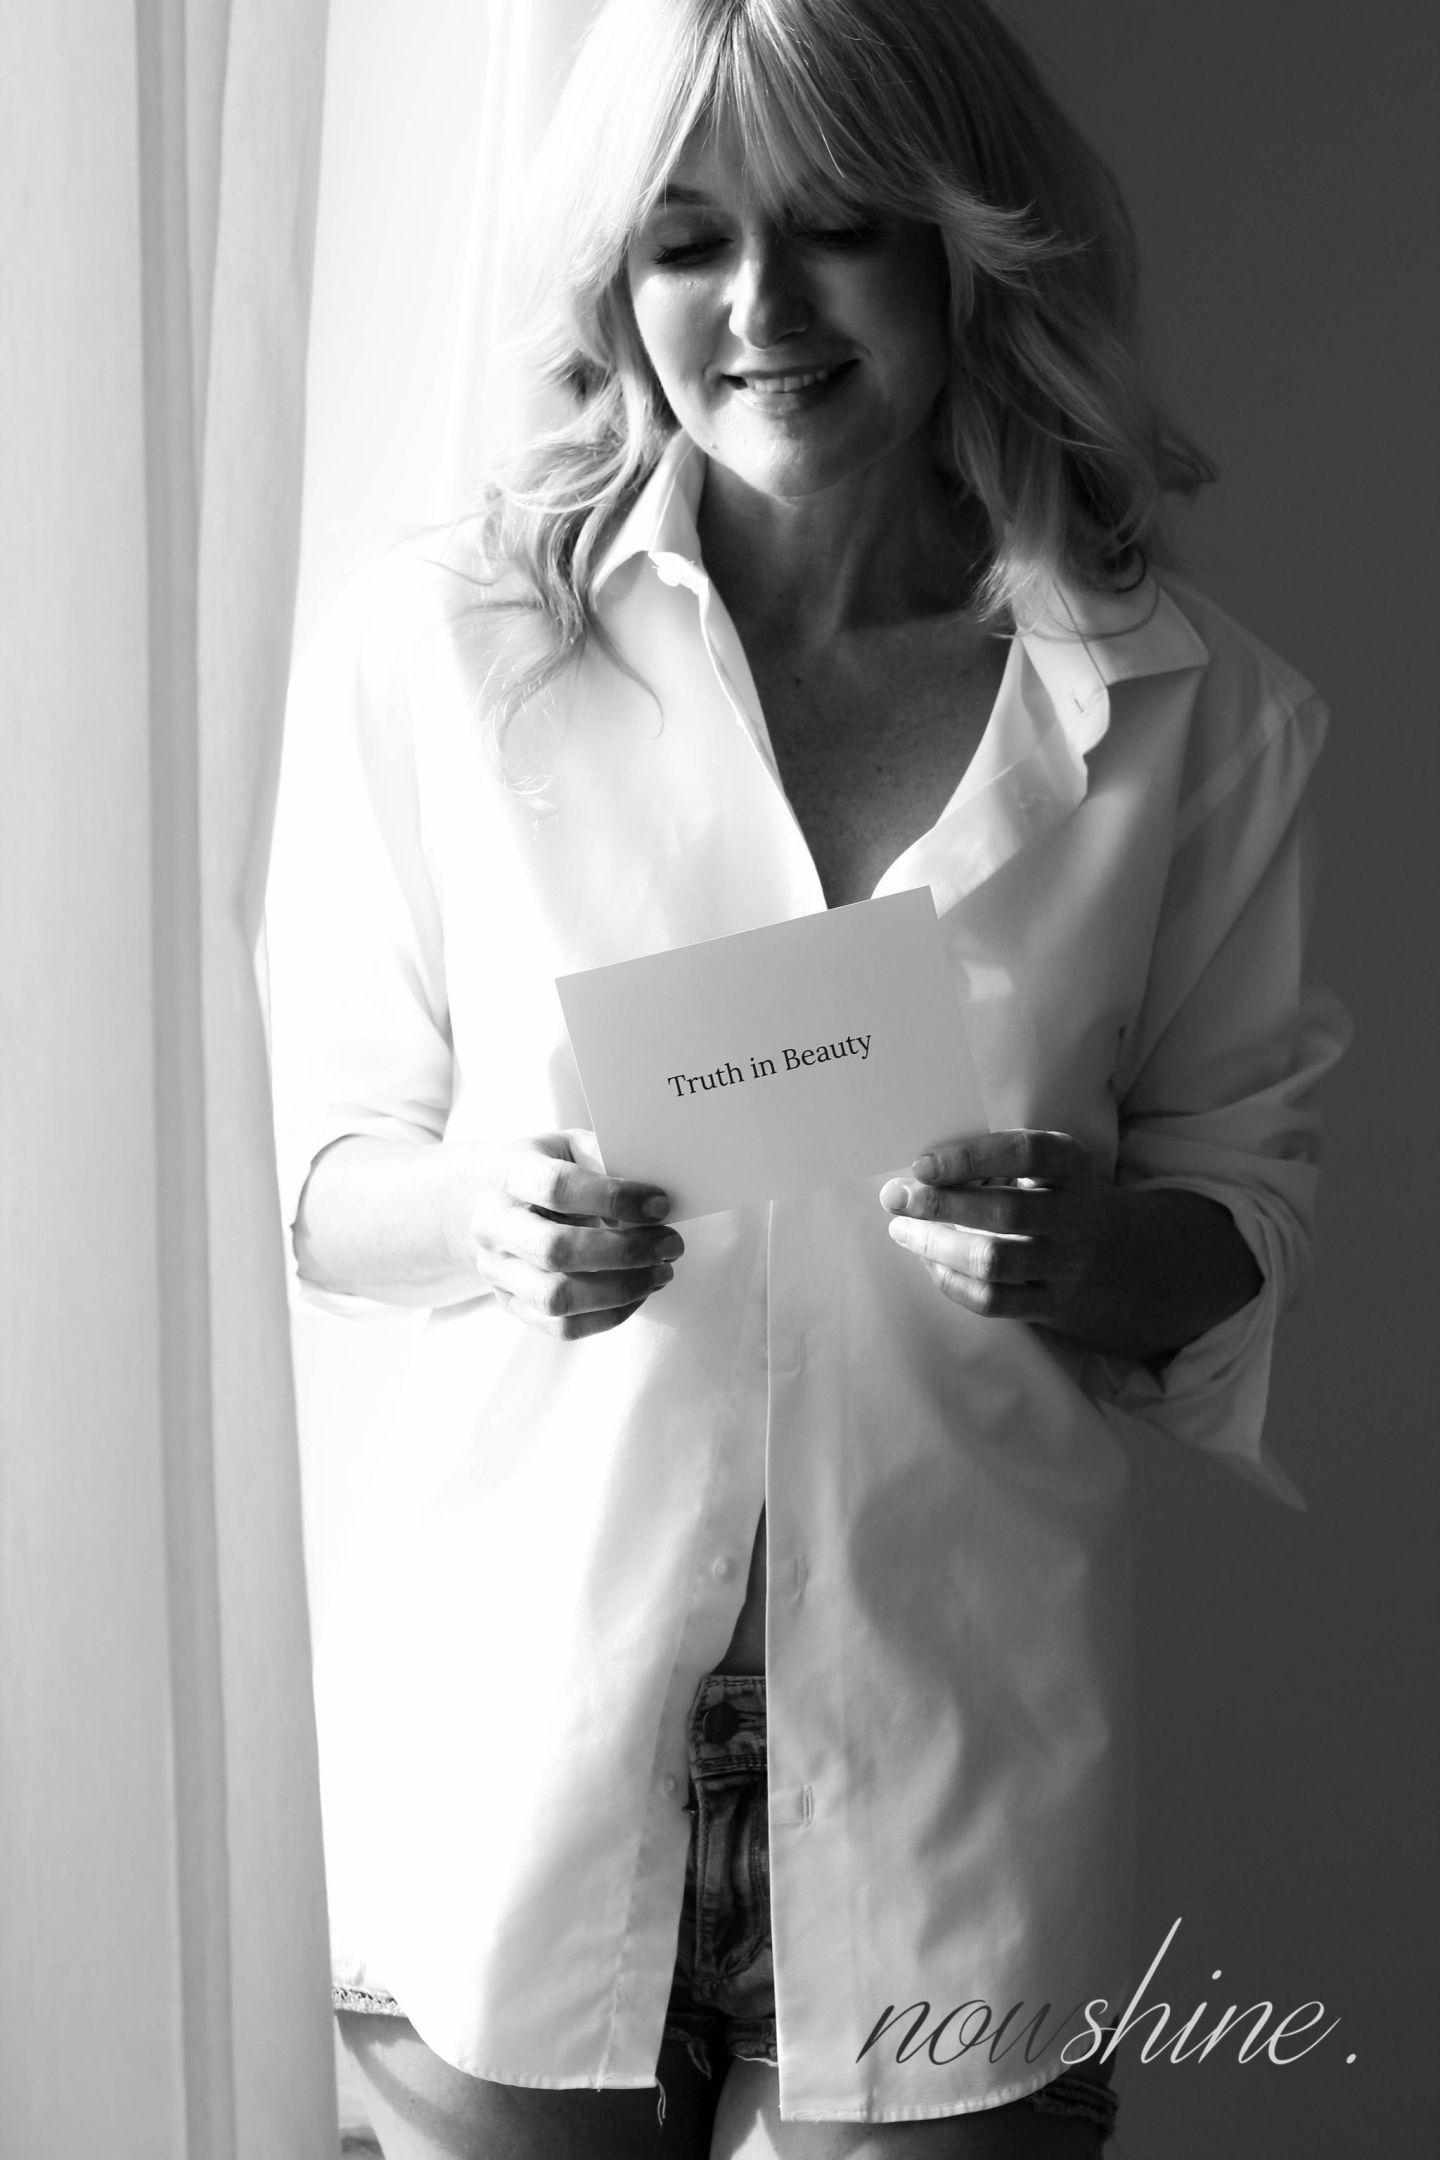 Pigmentflecken behandeln - Paula´s Choice truth in beauty - Nowshine Beauty Blog ü 40